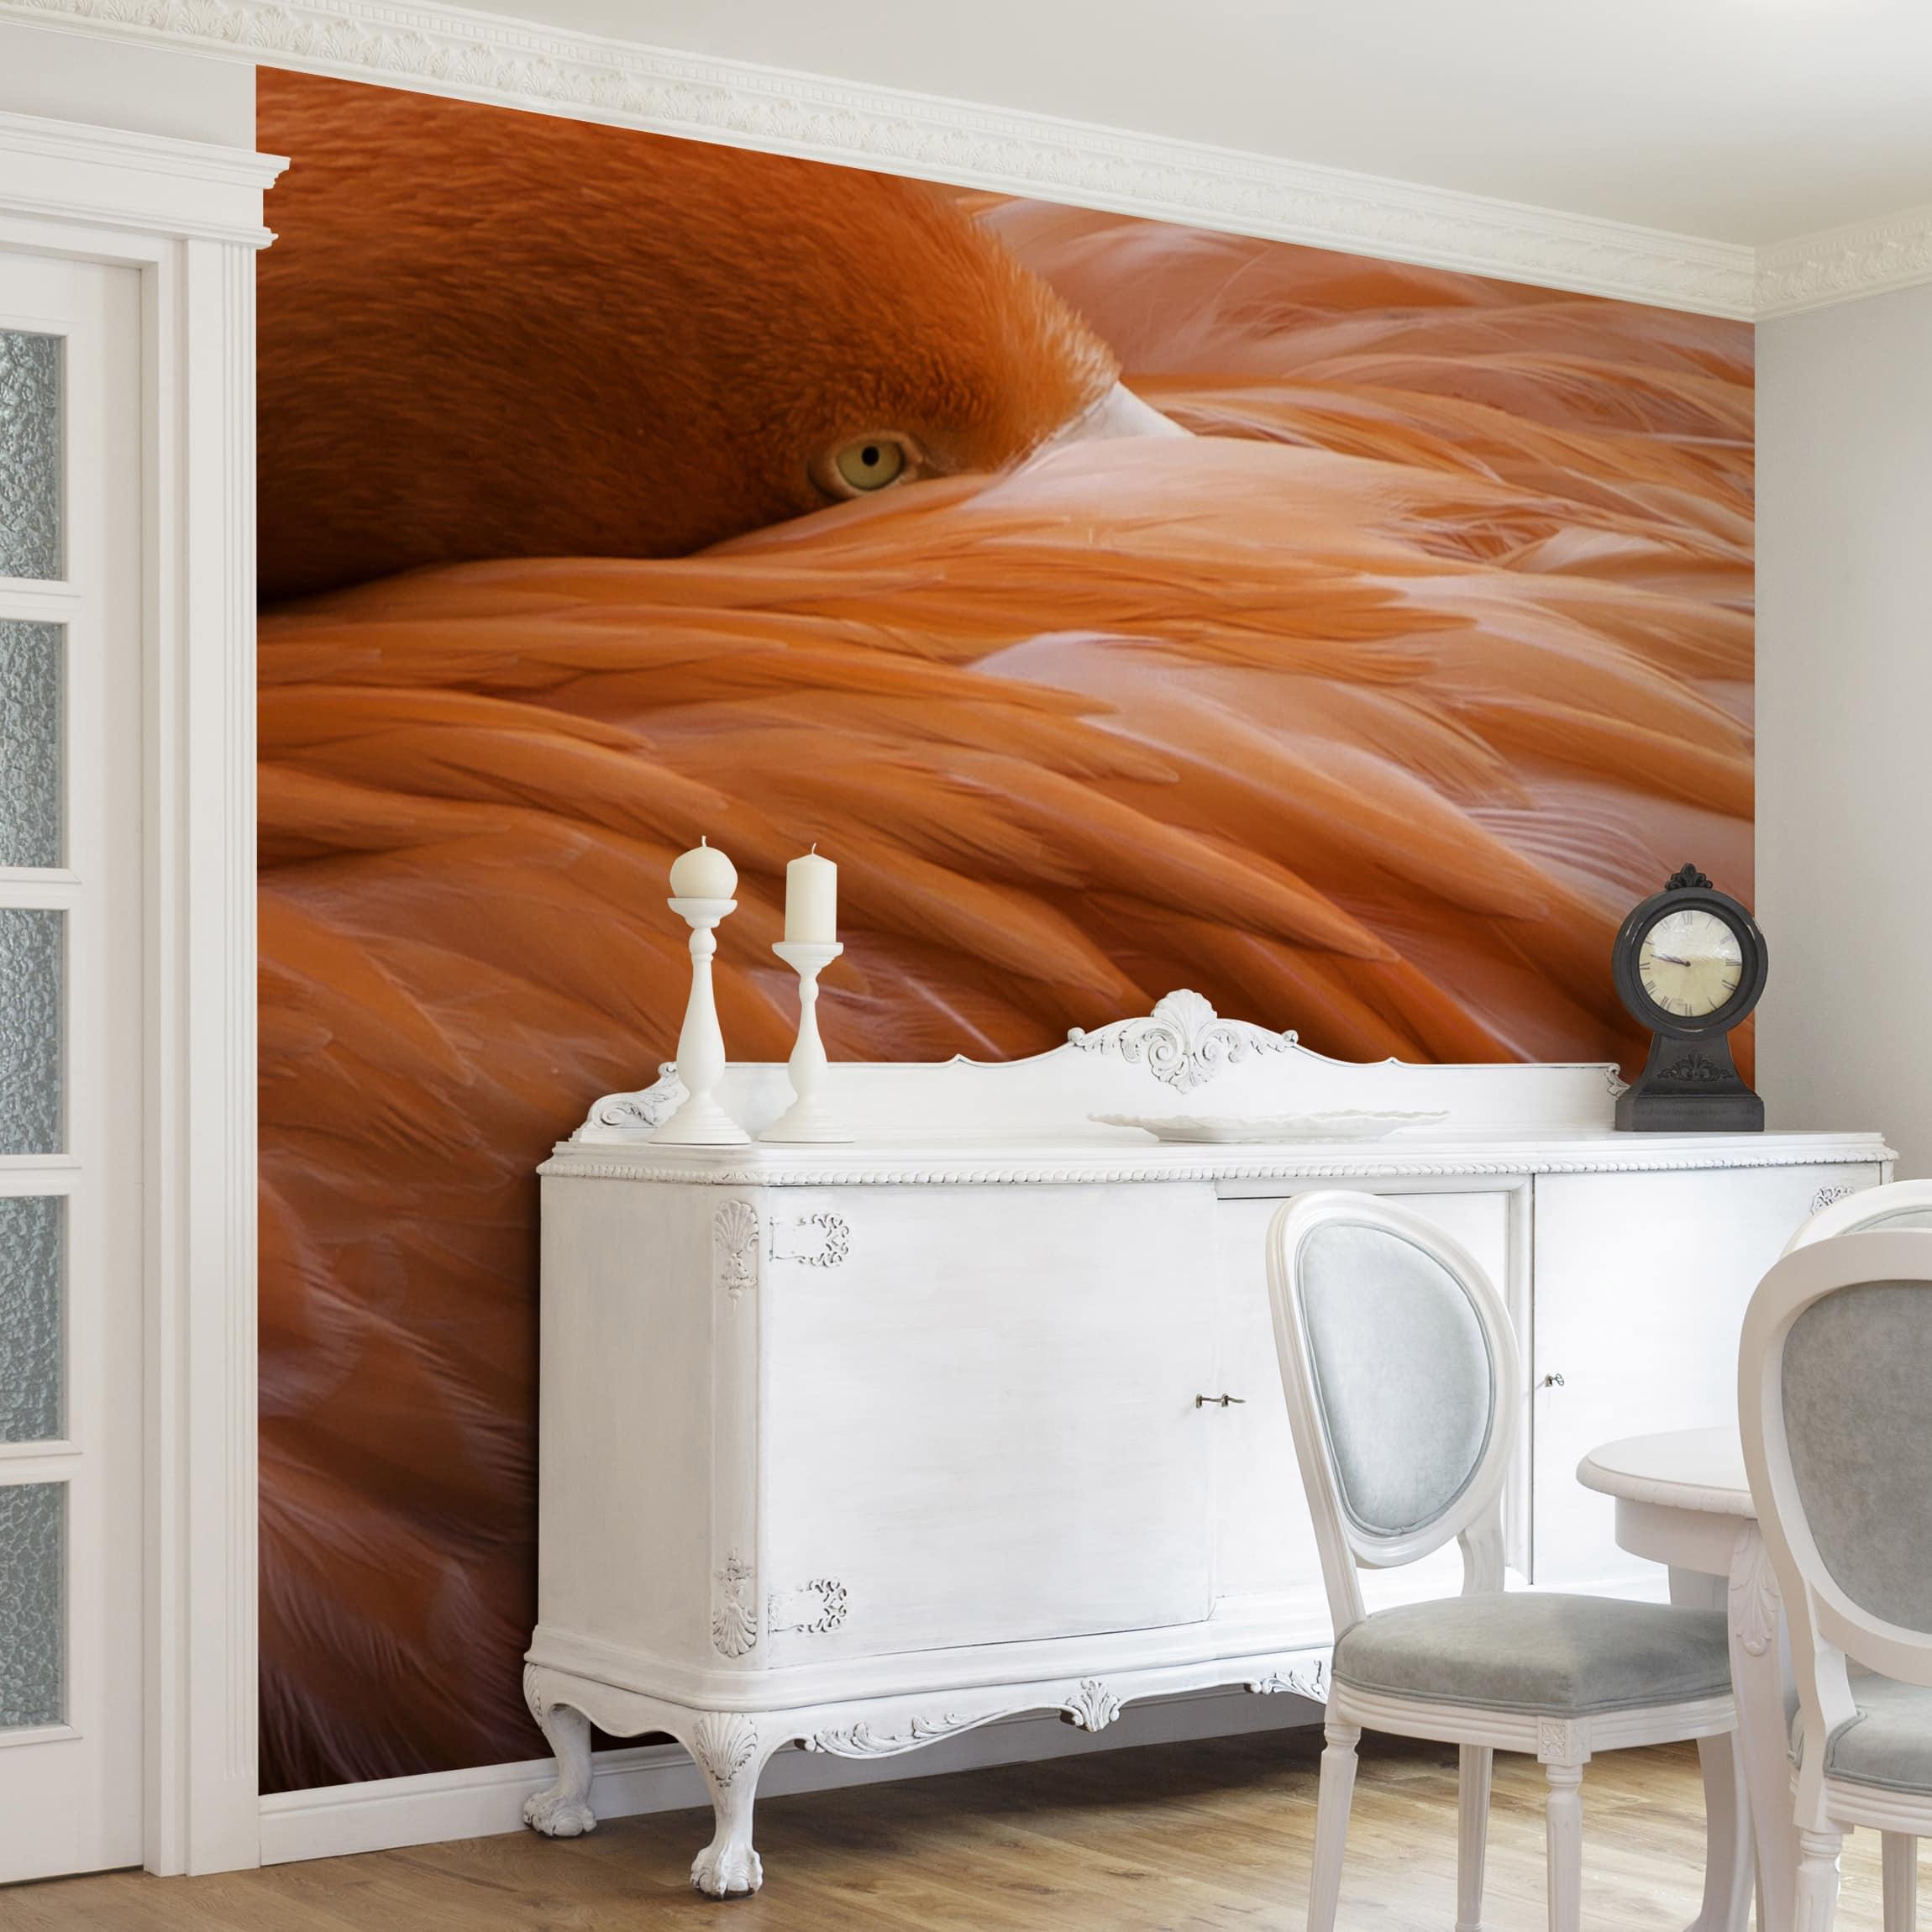 tapete selbstklebend flamingofedern wandbild quadratisch. Black Bedroom Furniture Sets. Home Design Ideas